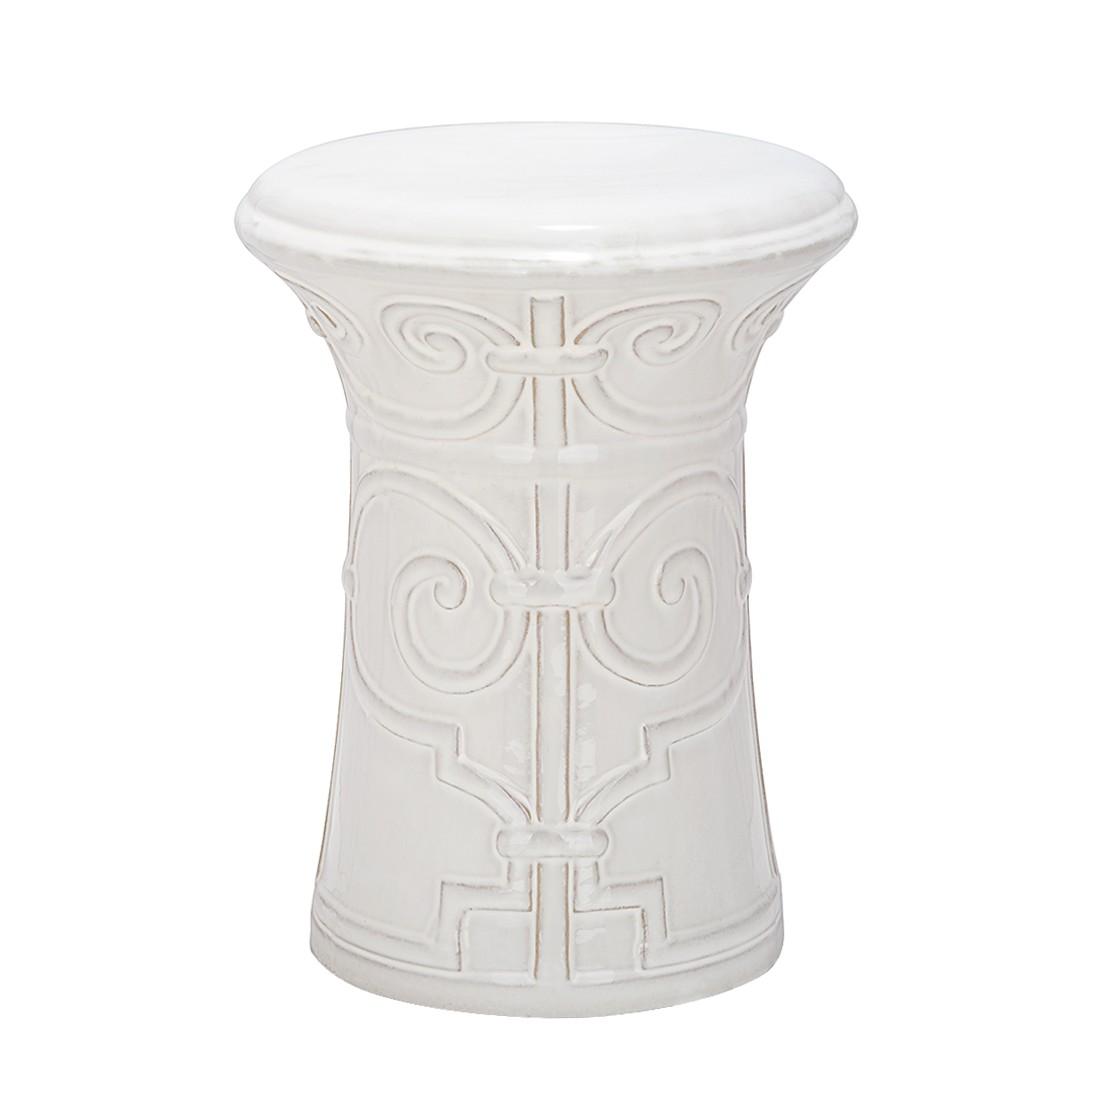 "Gartenhocker ""Imperial"" aus Keramik, weiß (Kopie)"